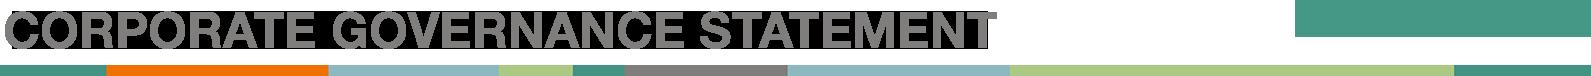 WDP Corporate Governance Statement - FR